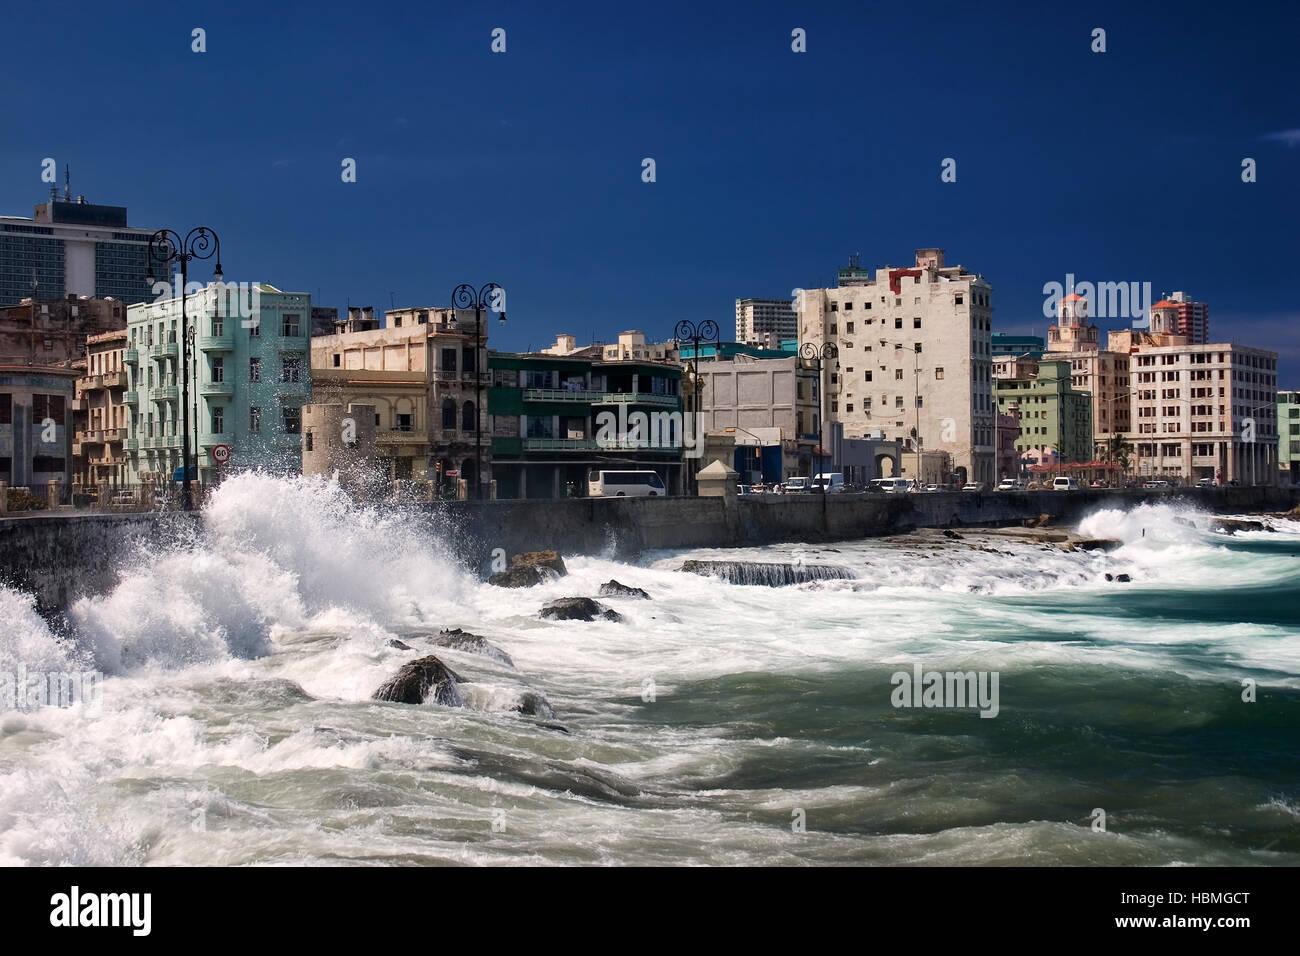 El Malecón, Cuba Stock Photo